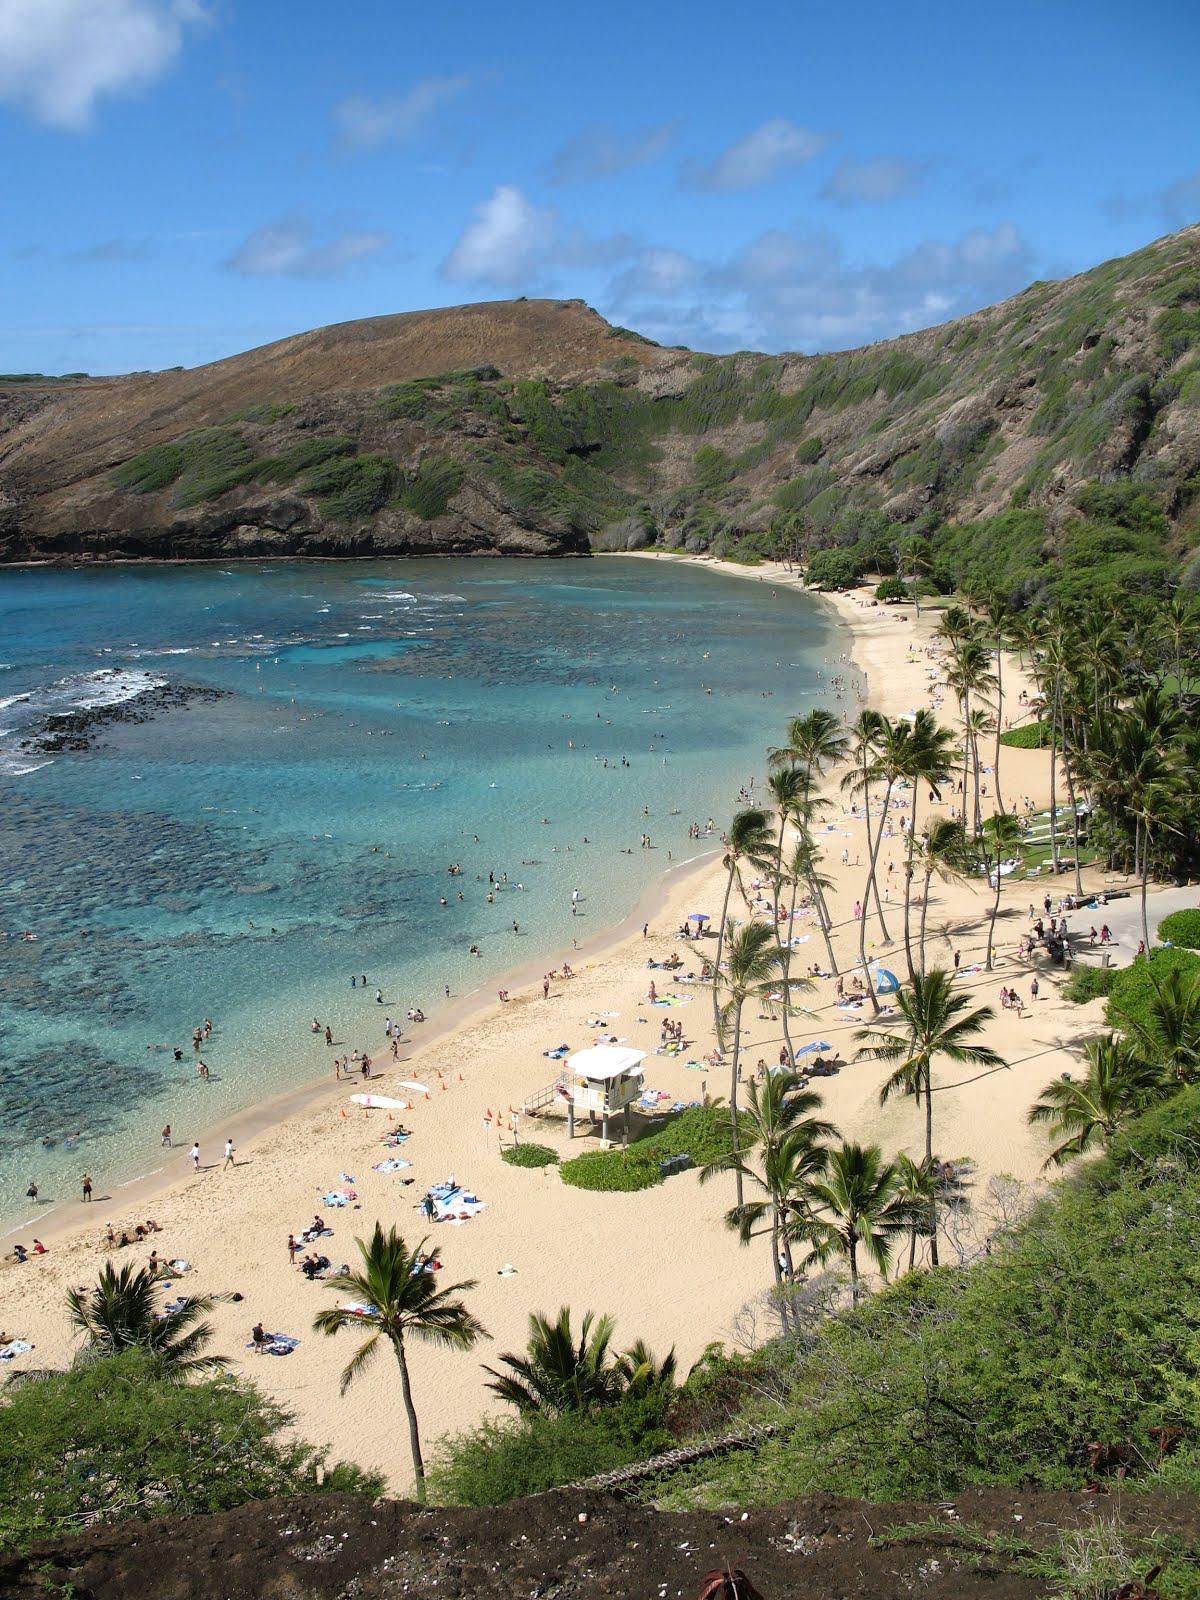 descriptive essay about the ocean writing descriptive essay about the beach